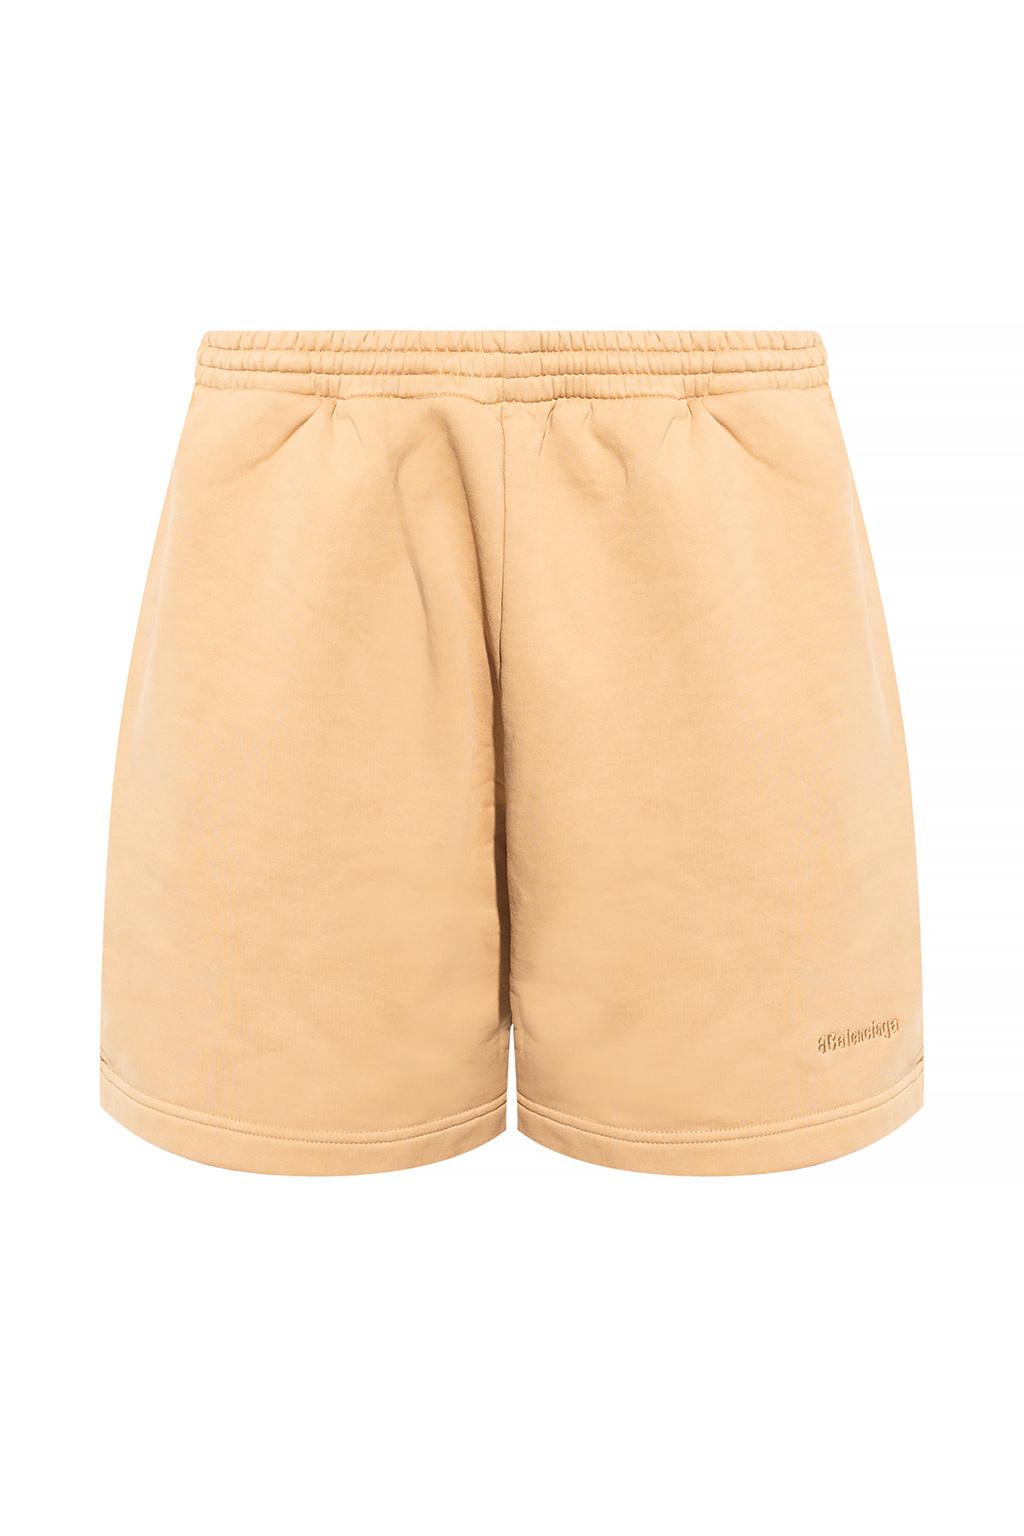 Balenciaga Sweat shorts with logo